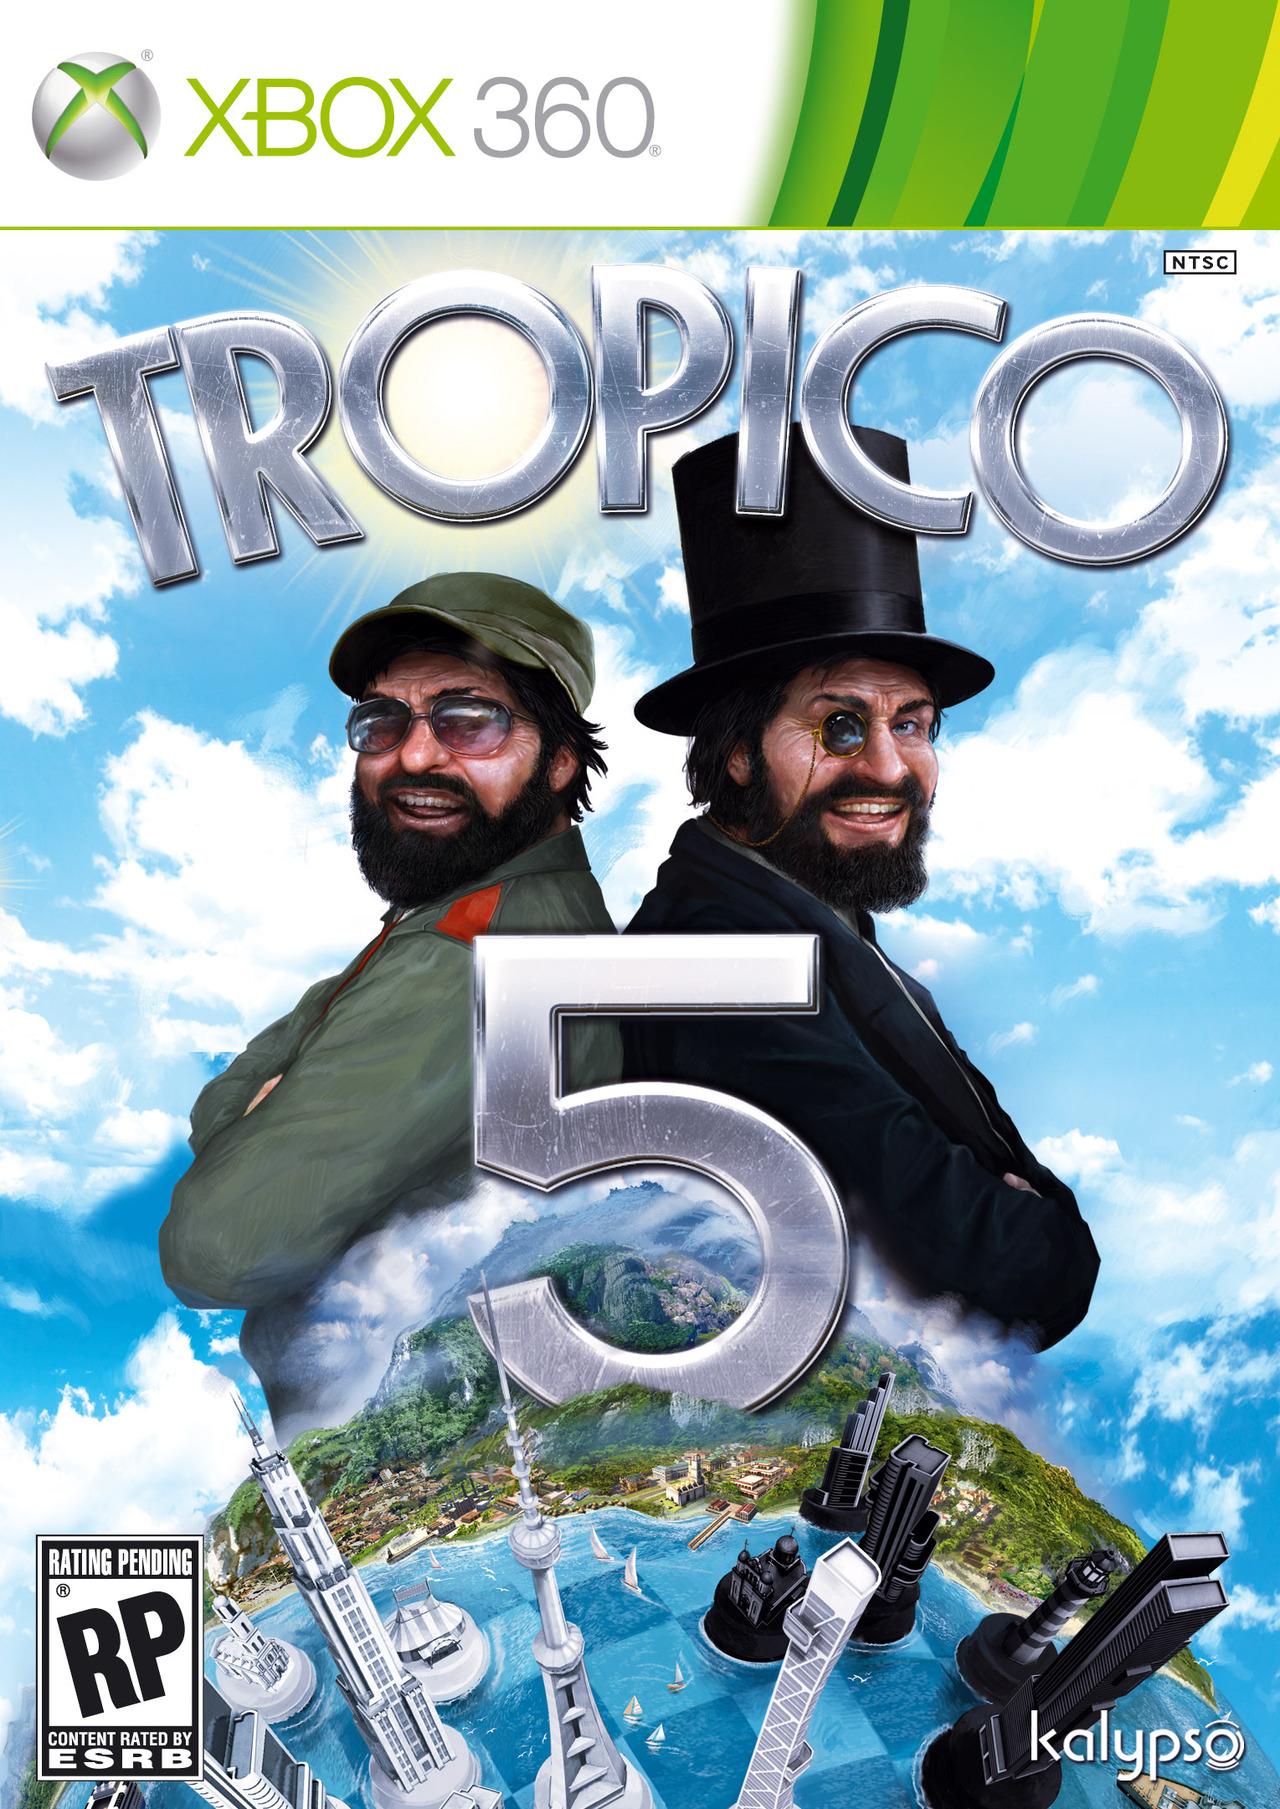 Tropico 5 Limited Edition (Xbox 360)